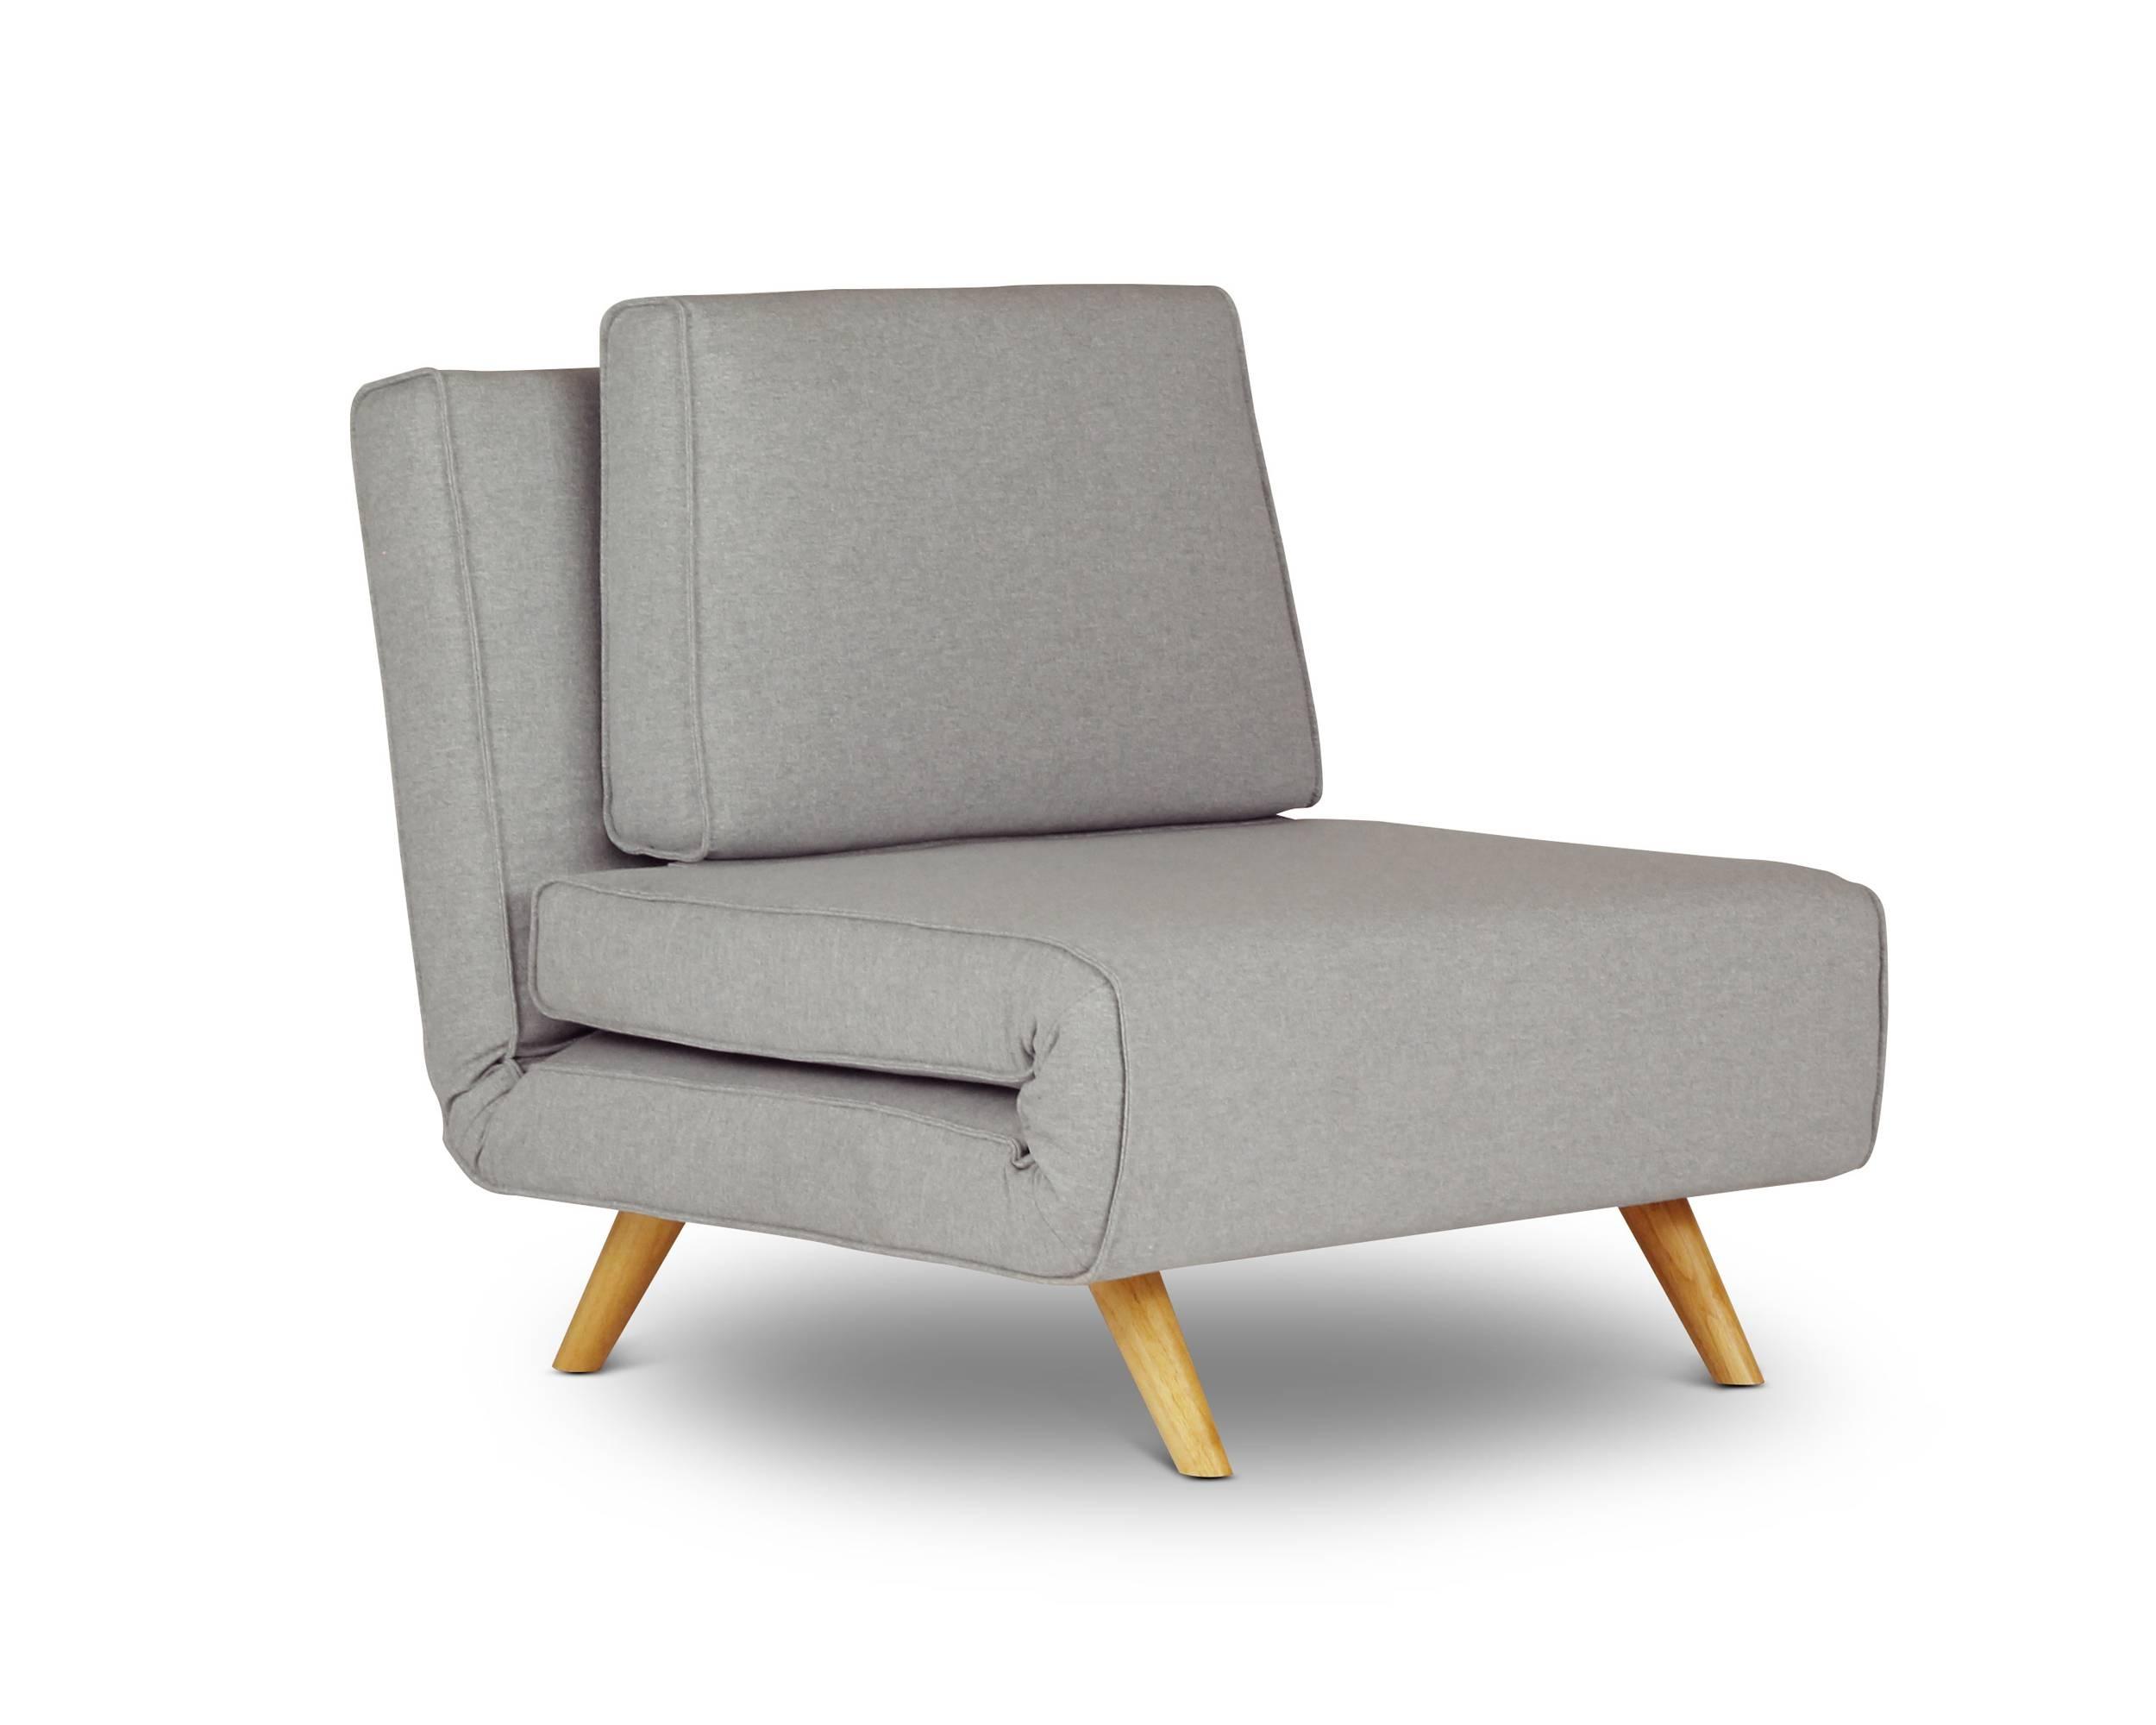 Sofas Center : Frightening Chair Sofa Photos Ideas Ikea Single pertaining to Single Sofa Chairs (Image 23 of 30)